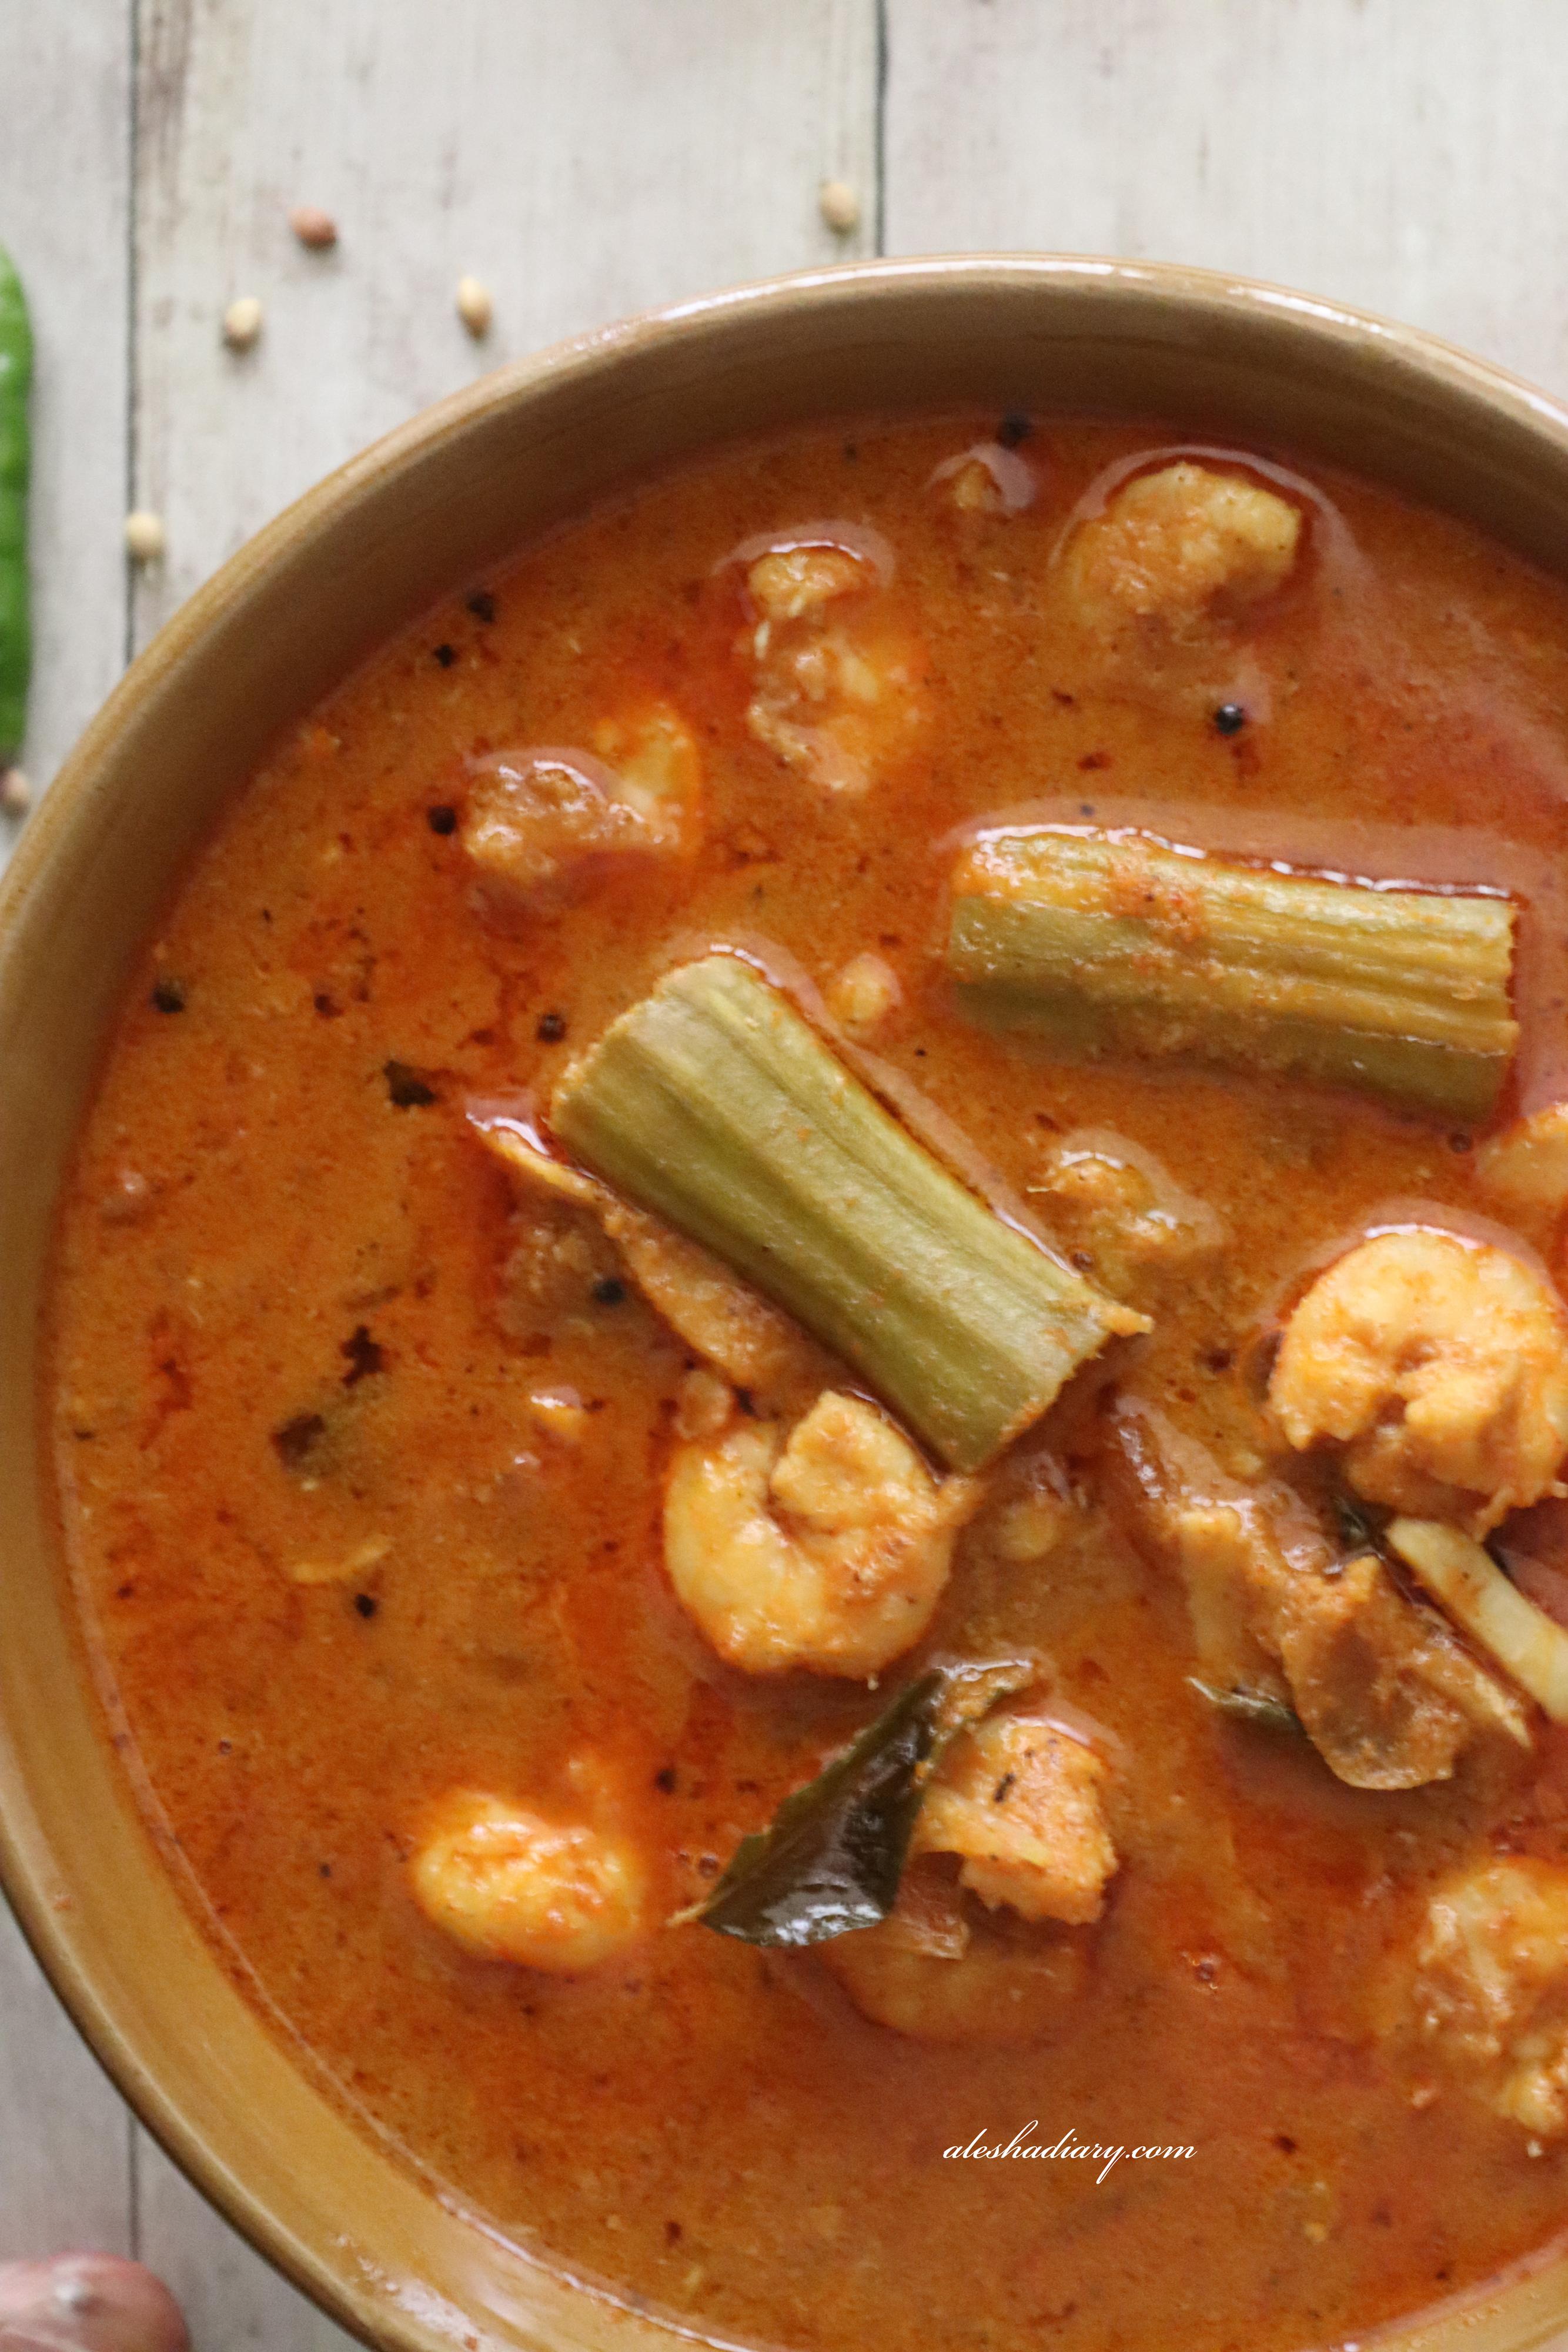 Prawn Drumstick curry – Eral murungaikkai Kuzhambu – இறால் முருங்கைக்காய் குழம்பு